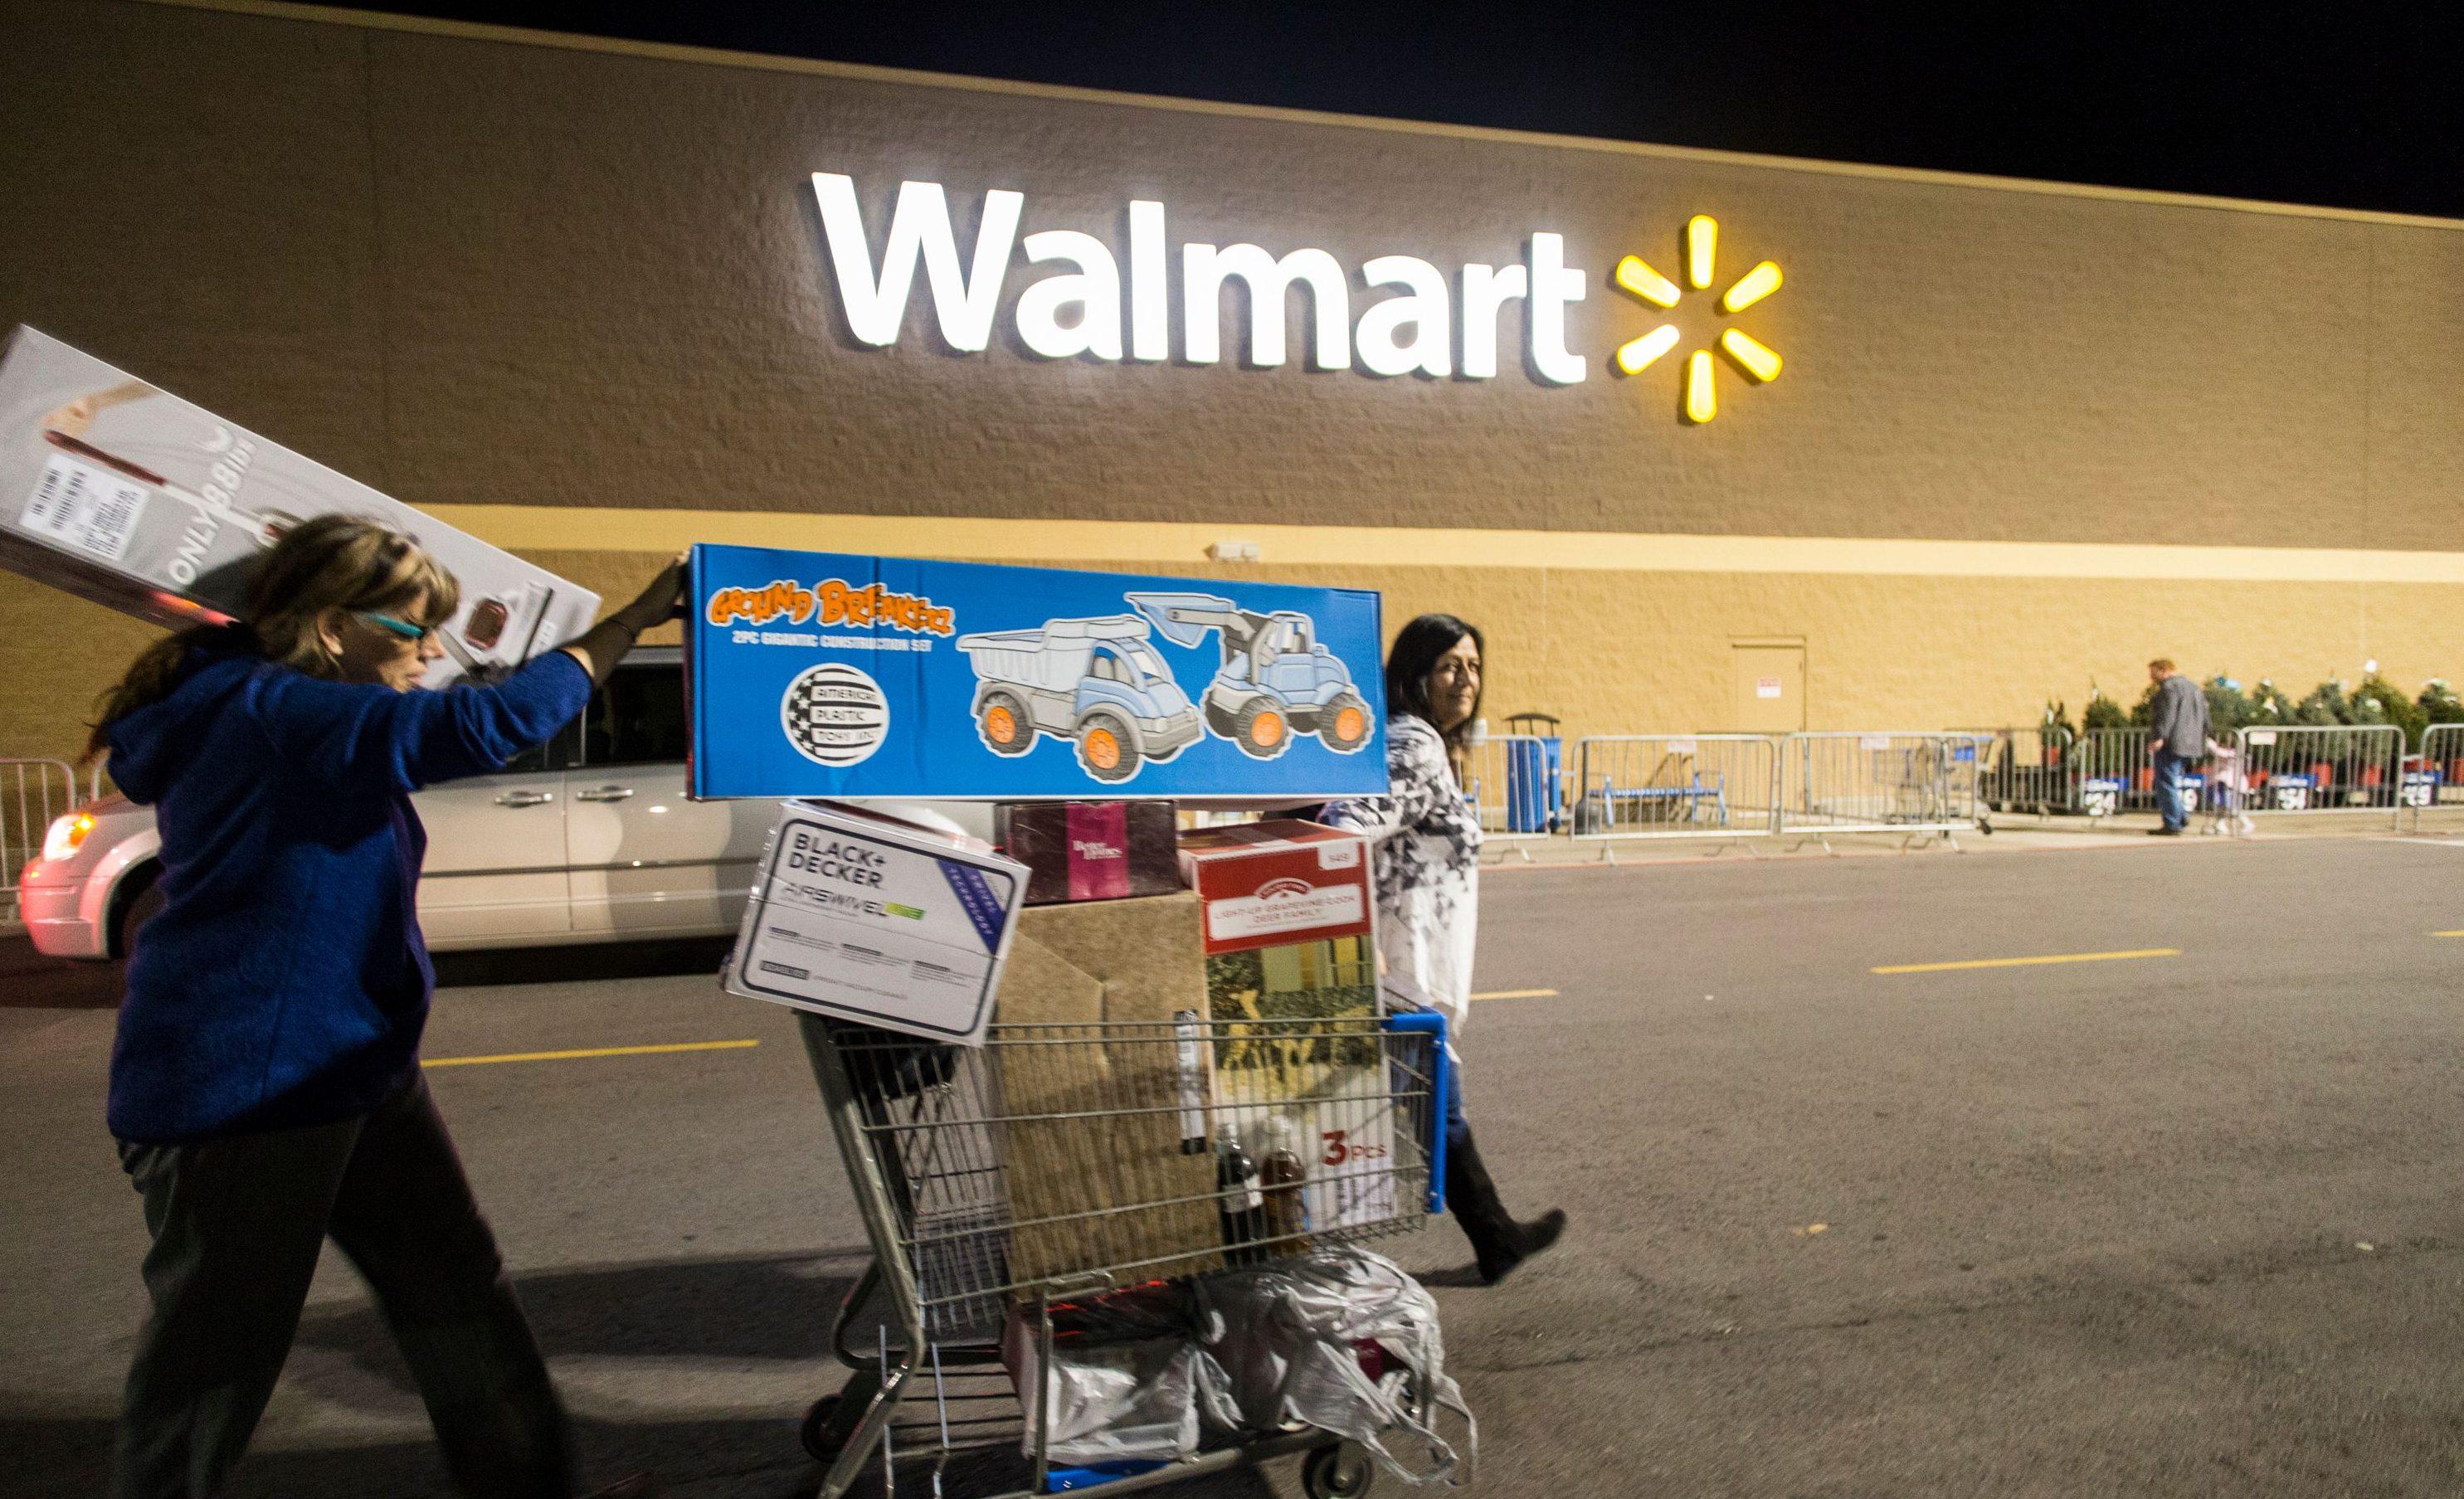 Walmart is the world's biggest company